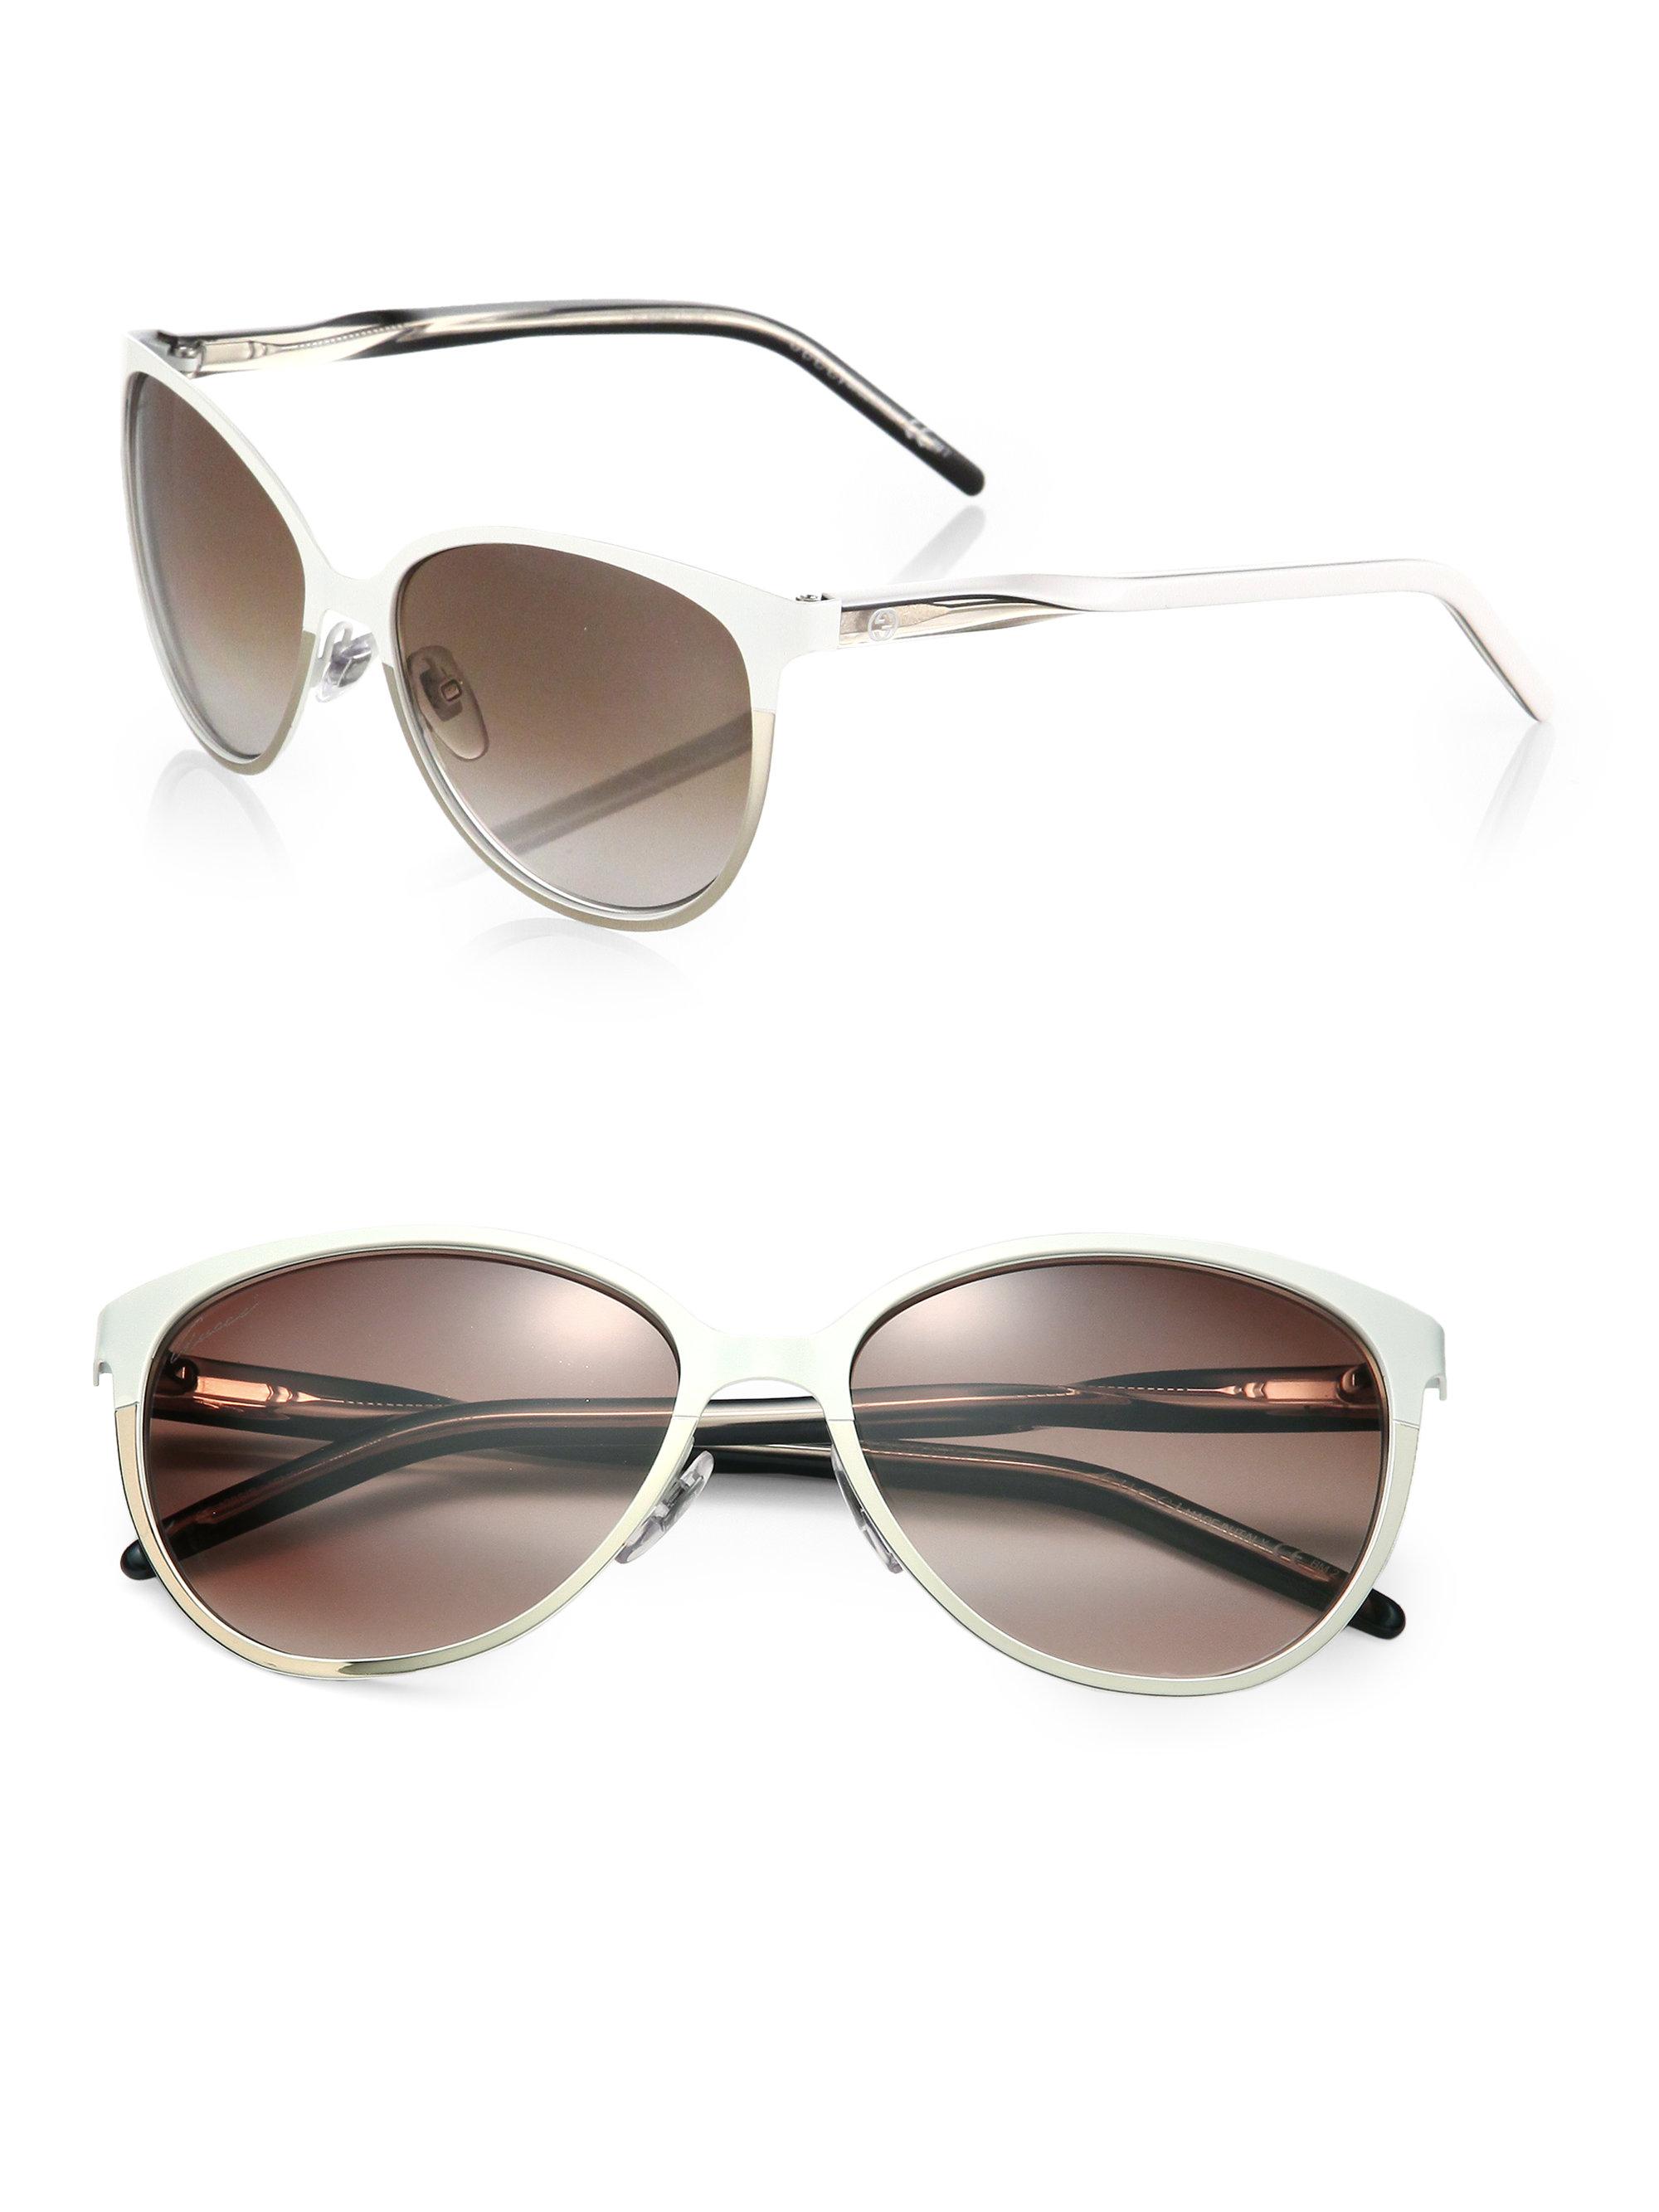 95f1adf2529 Lyst - Gucci Optyl Round Sunglasses in White